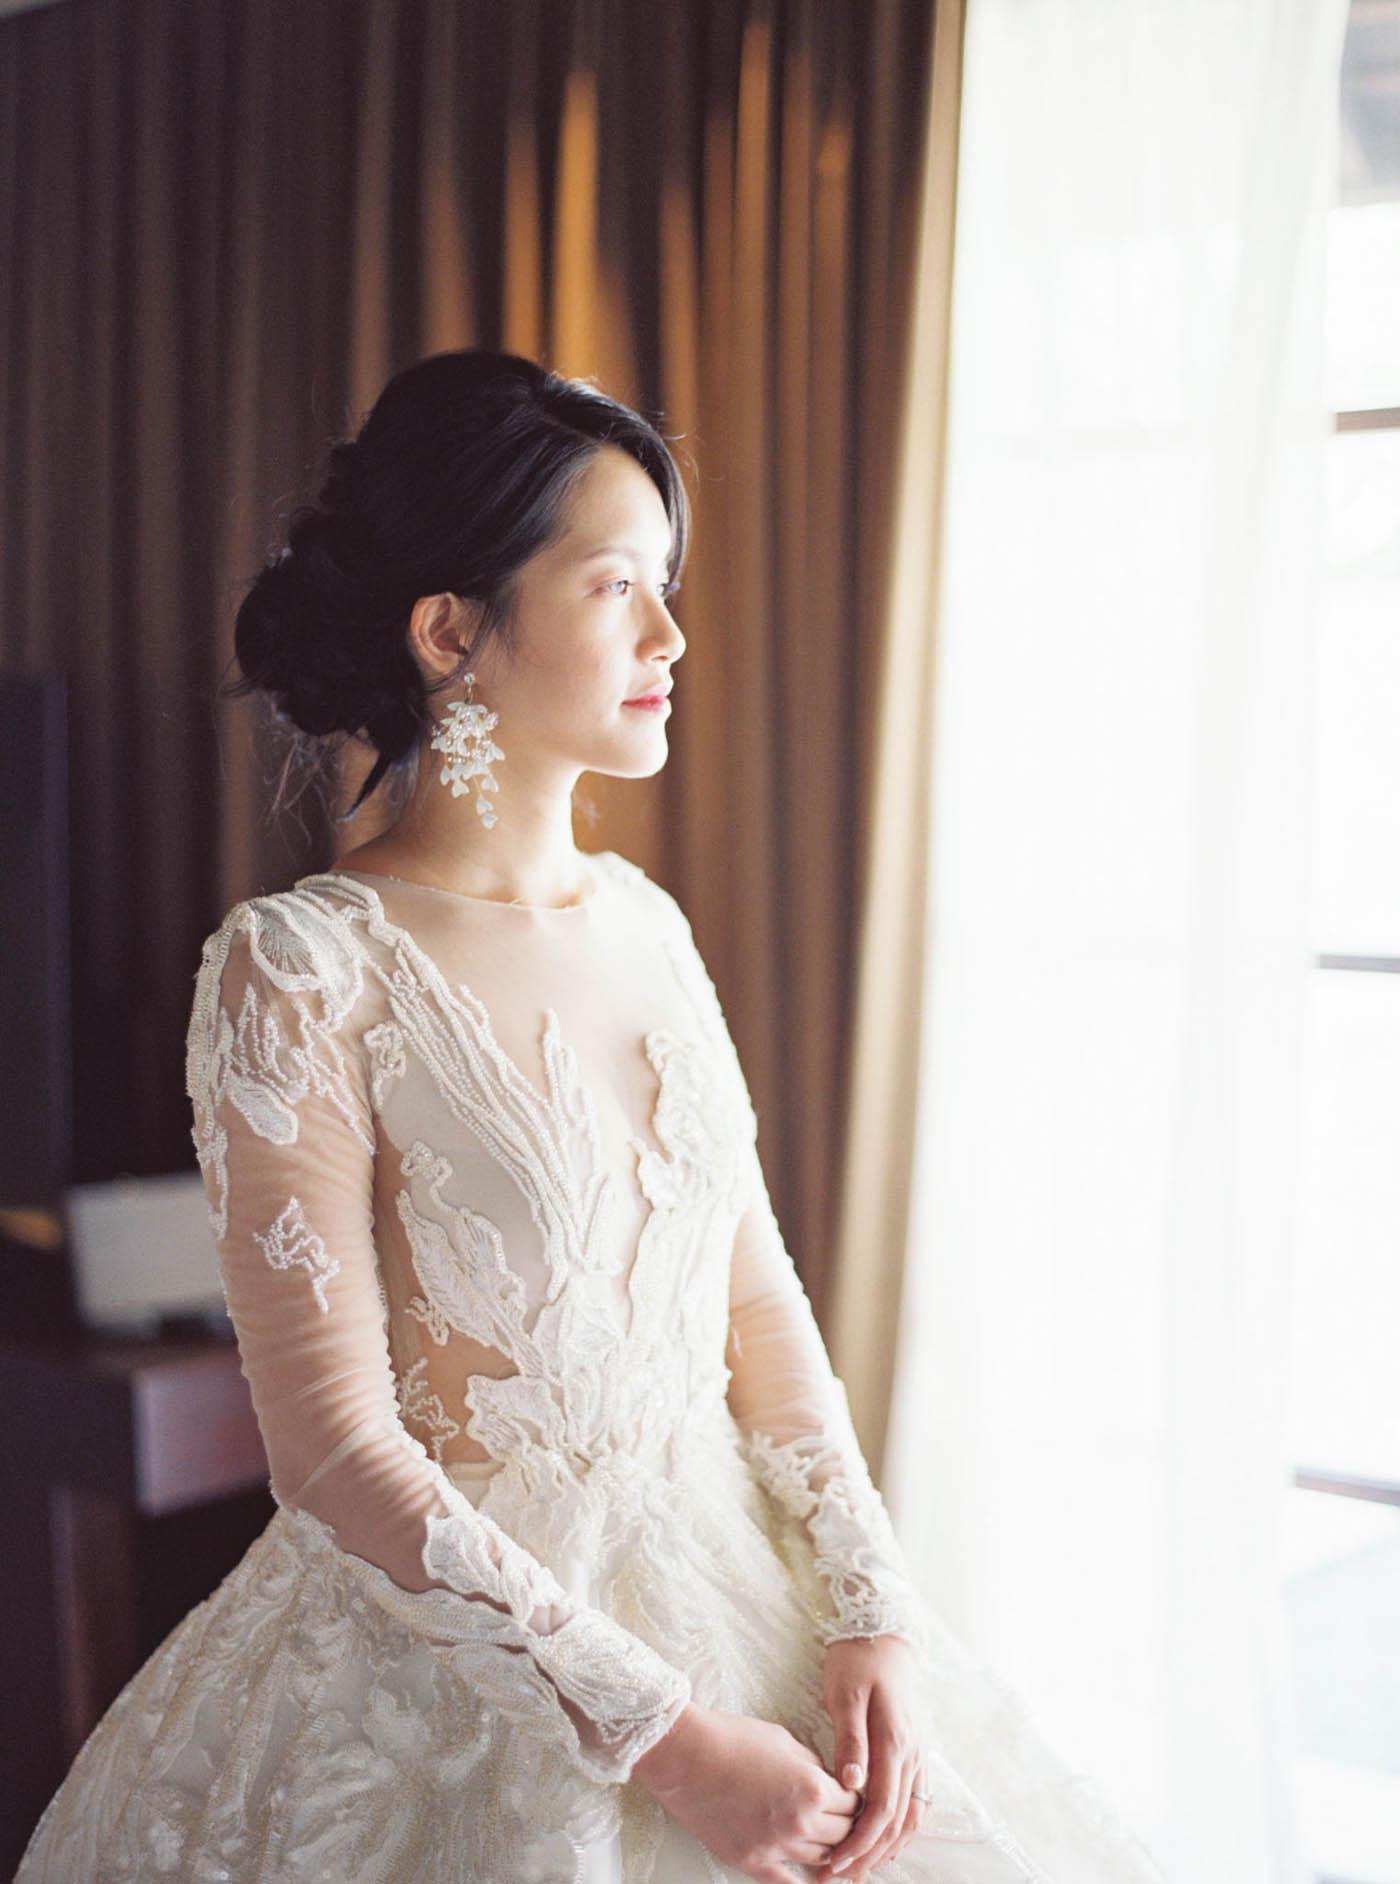 婚禮 Royal Santrian婚禮-STAGE-fine-art-film-wedding-海外